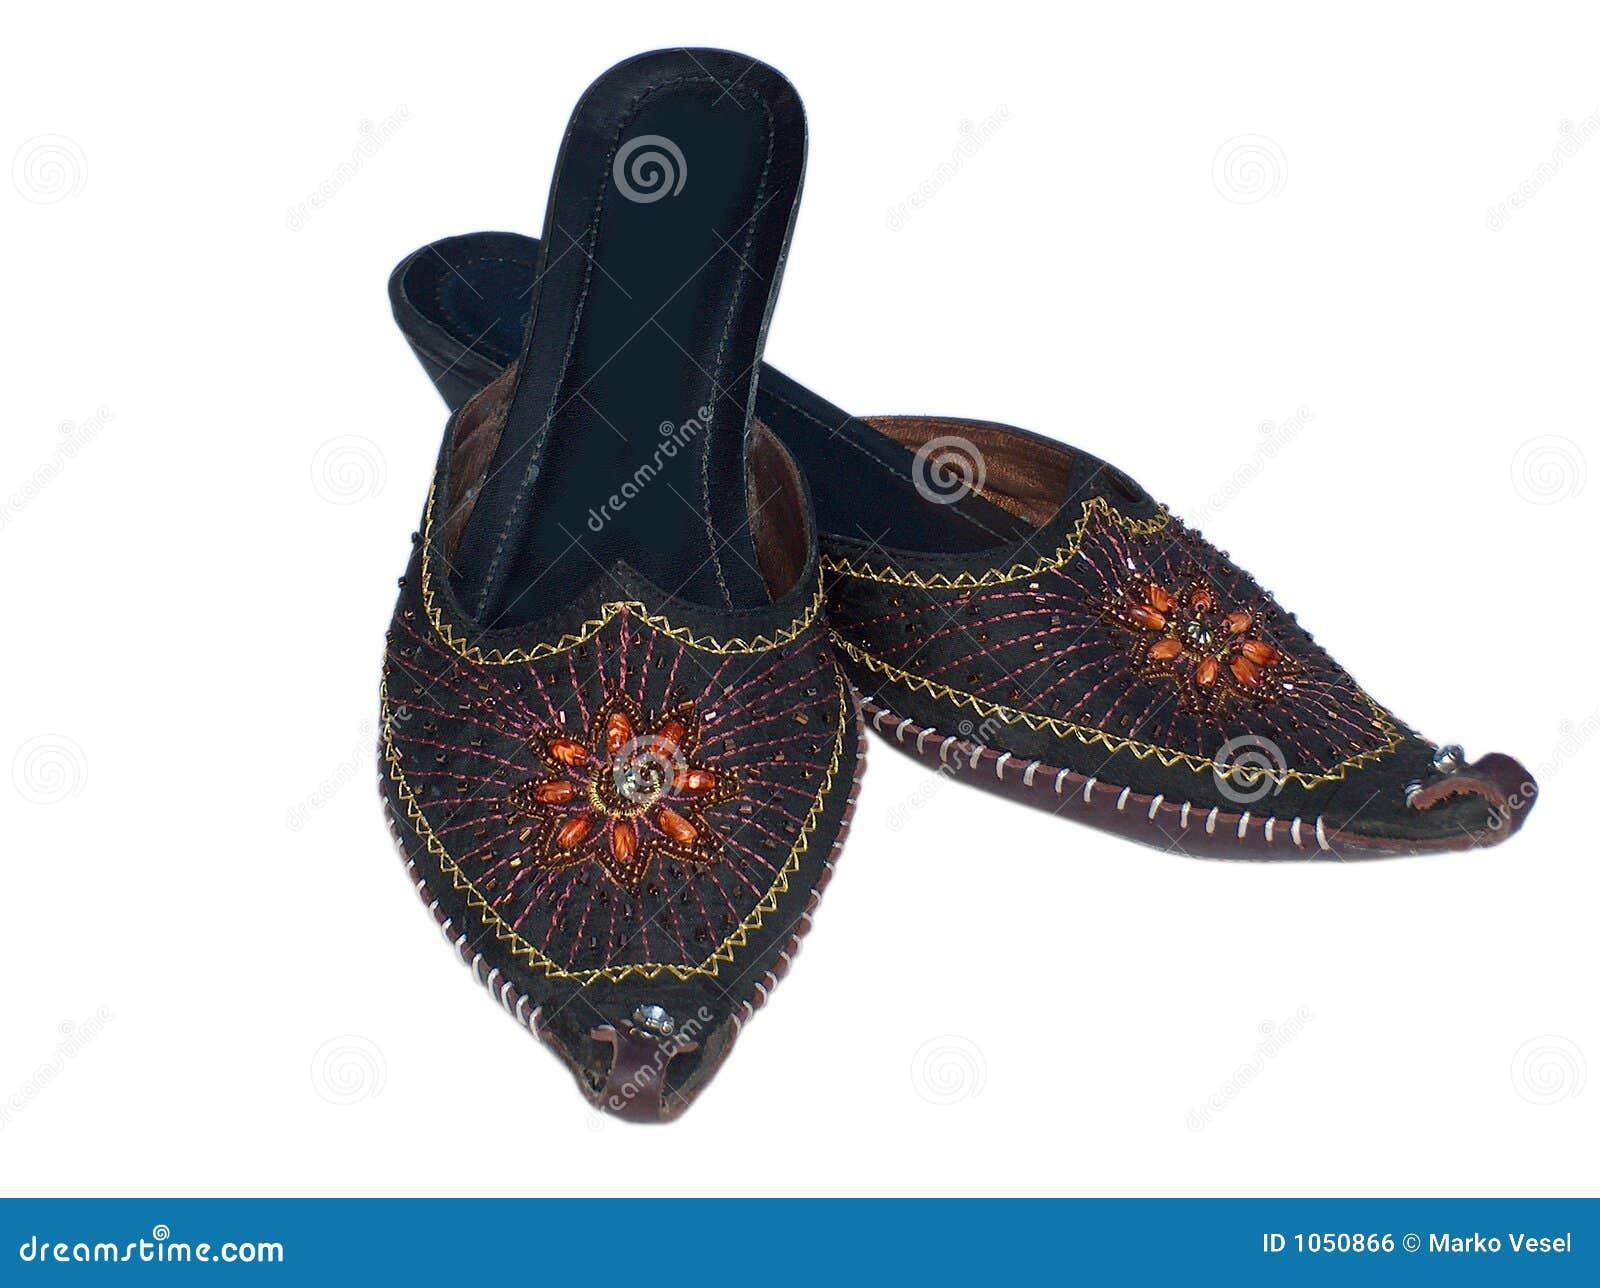 ec33edf2eb3cb Oriental sandals stock photo. Image of pair, black, isolated - 1050866